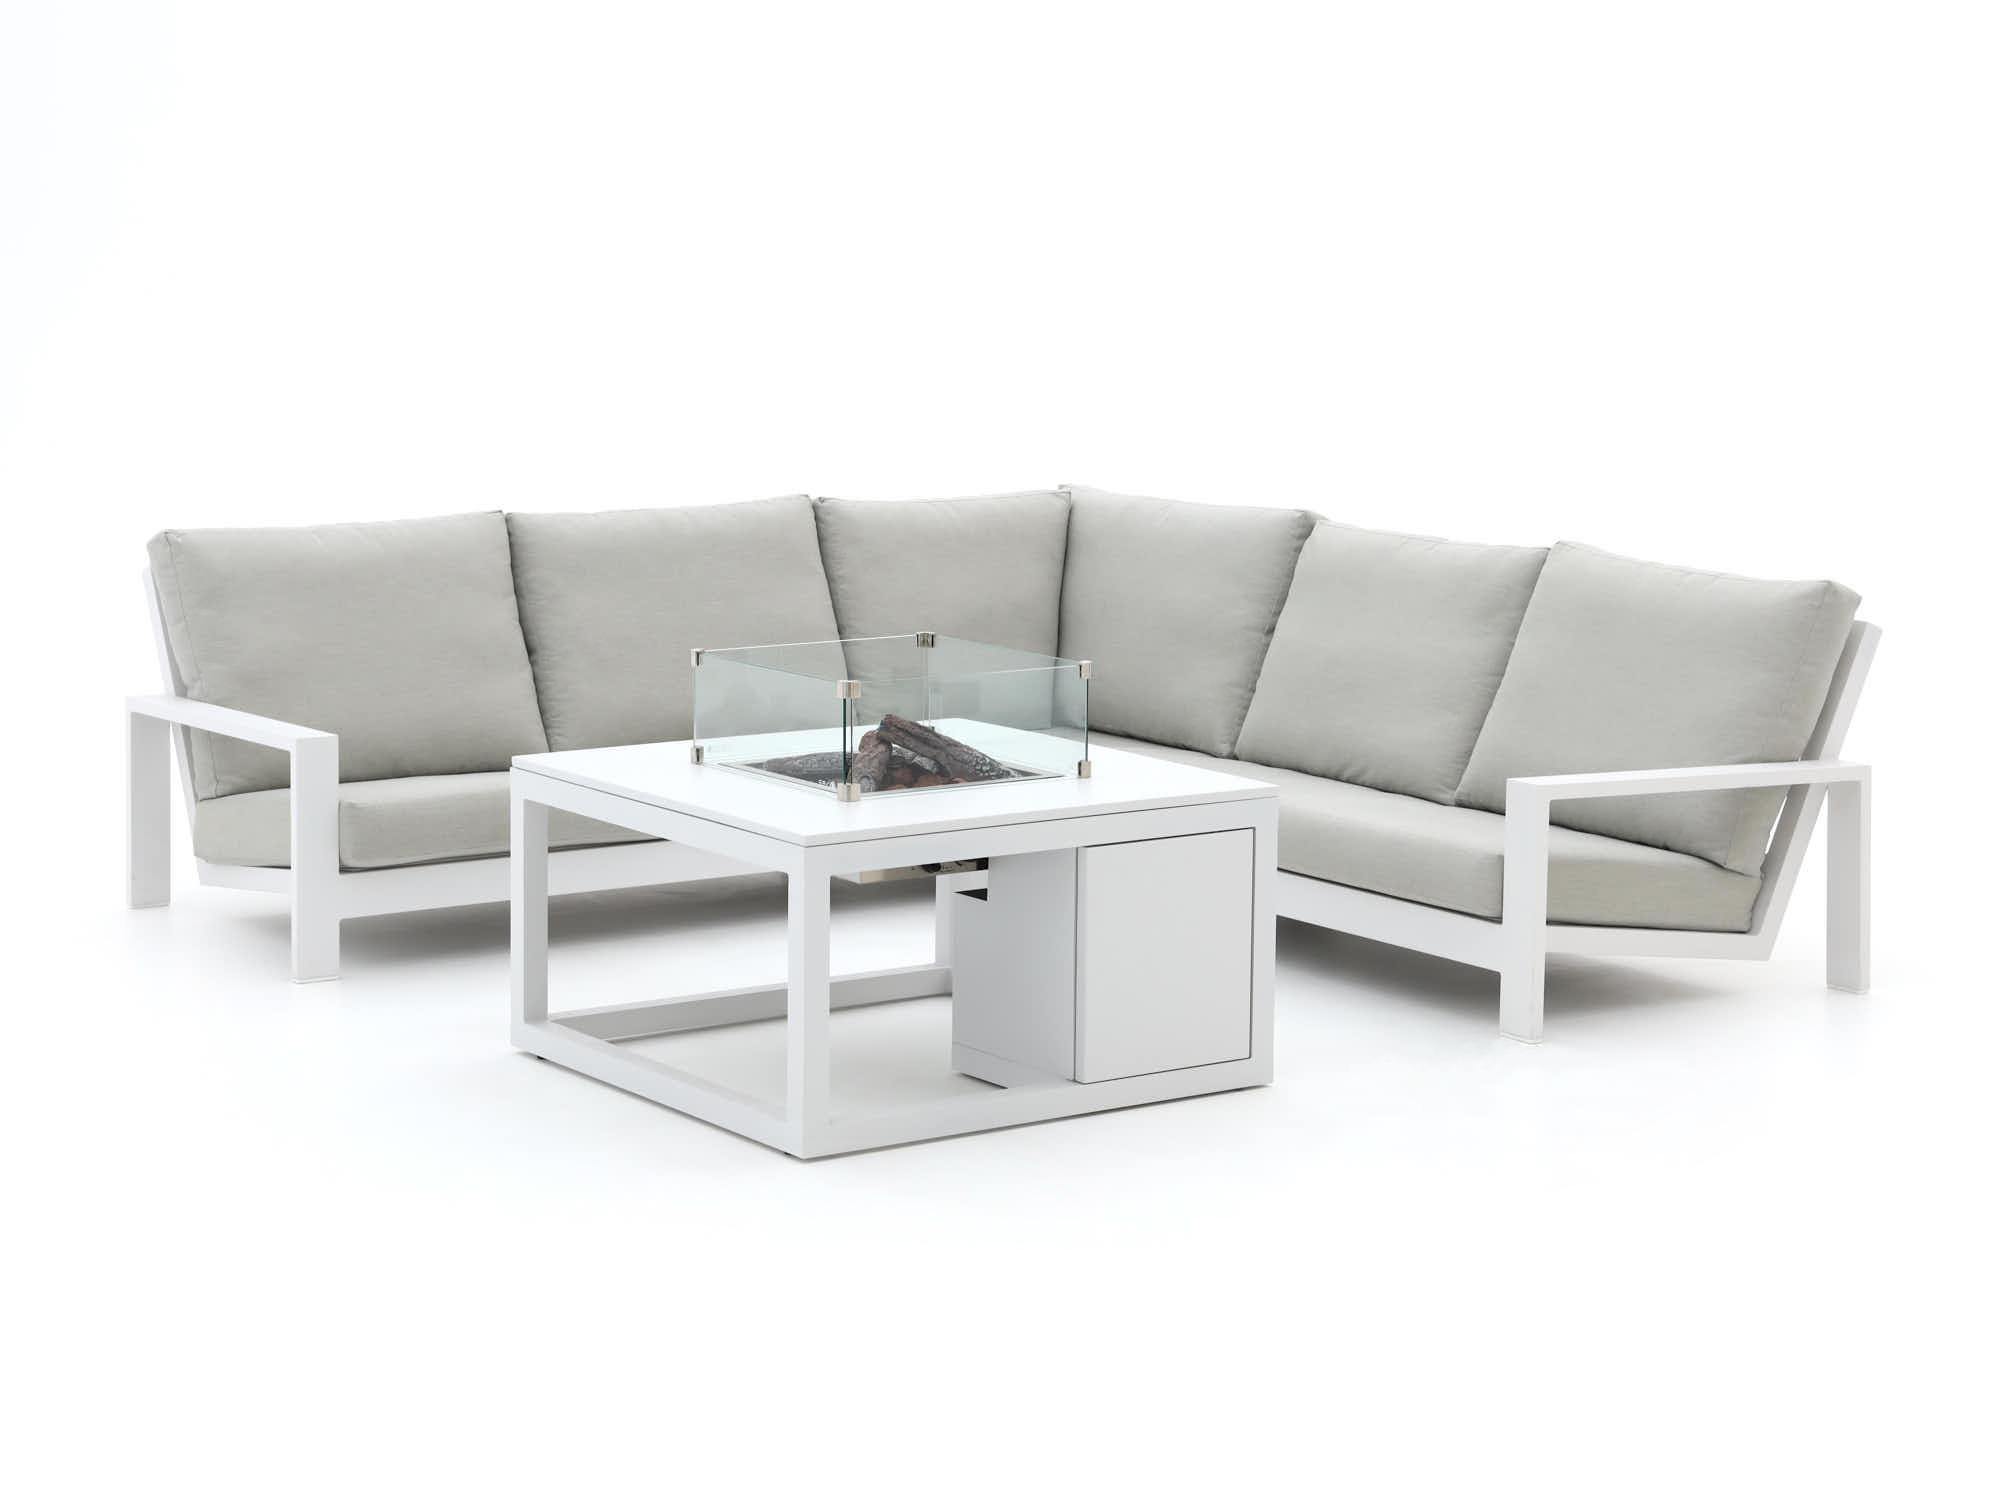 Bellagio Vezzano/Cosi 100cm hoek loungeset 4-delig - Laagste prijsgarantie!